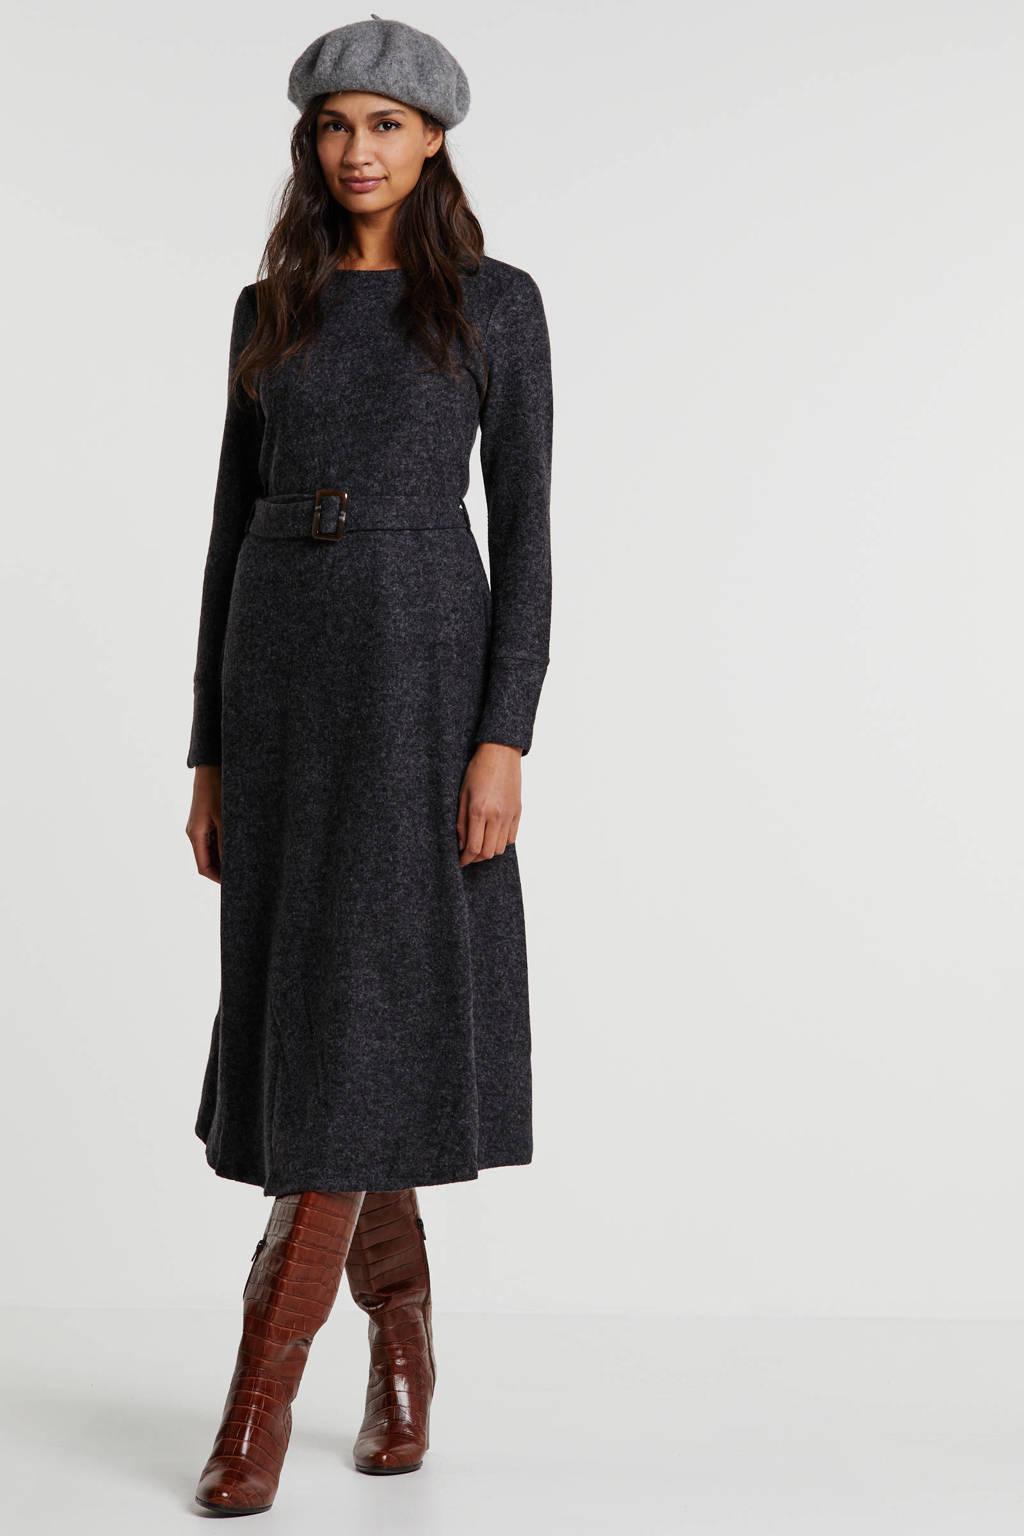 ESPRIT Women Collection gemêleerde A-lijn jurk grijs, Grijs